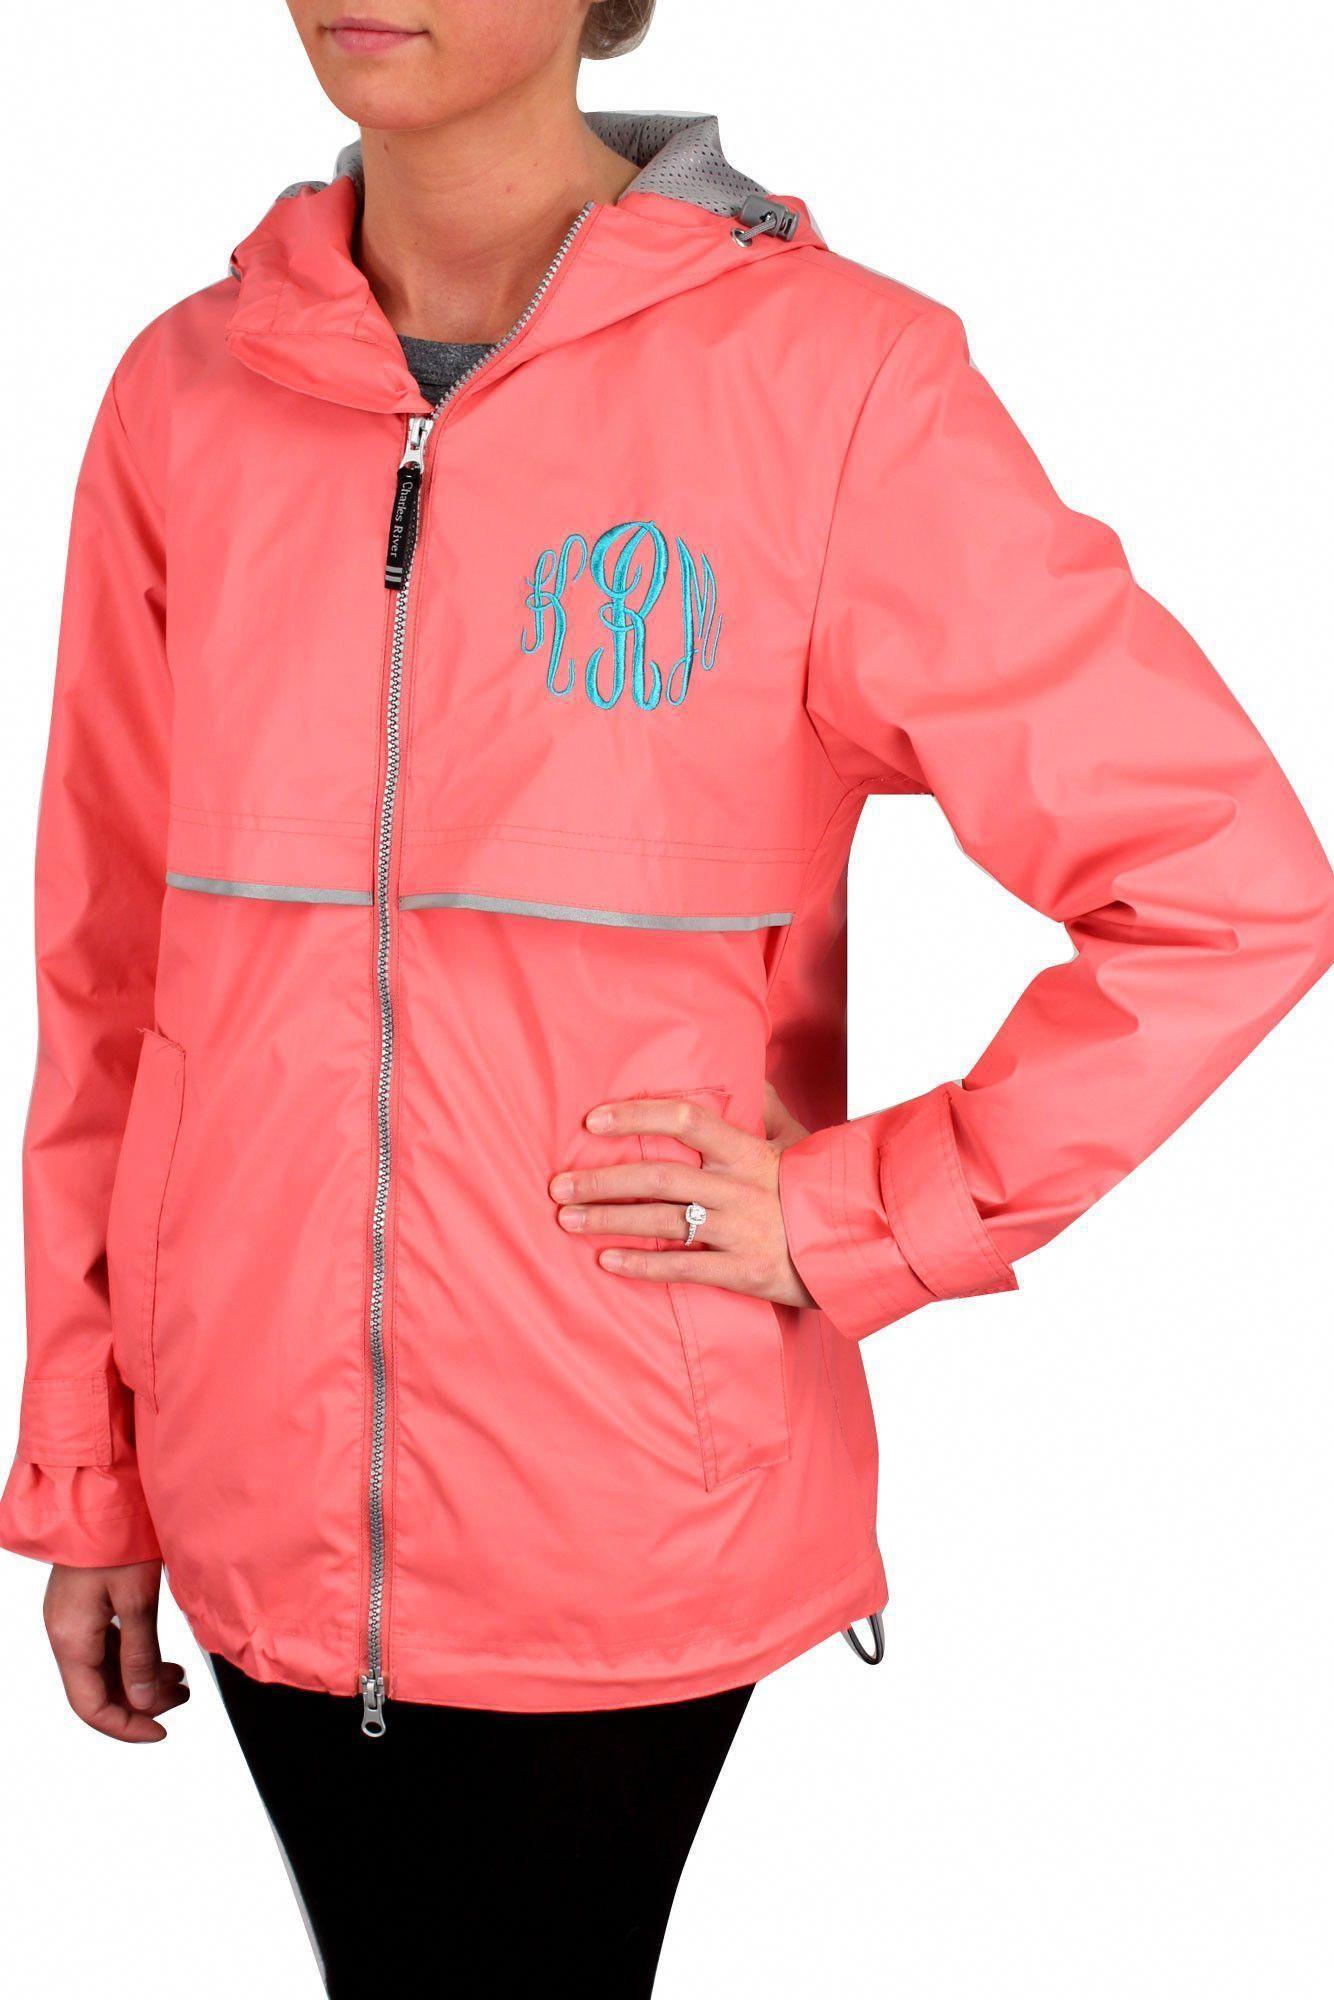 7f4cae8ee84 Charles River Women s New Englander Coral Rain Jacket  5099  Customizable!   BestWomensraincoat2017